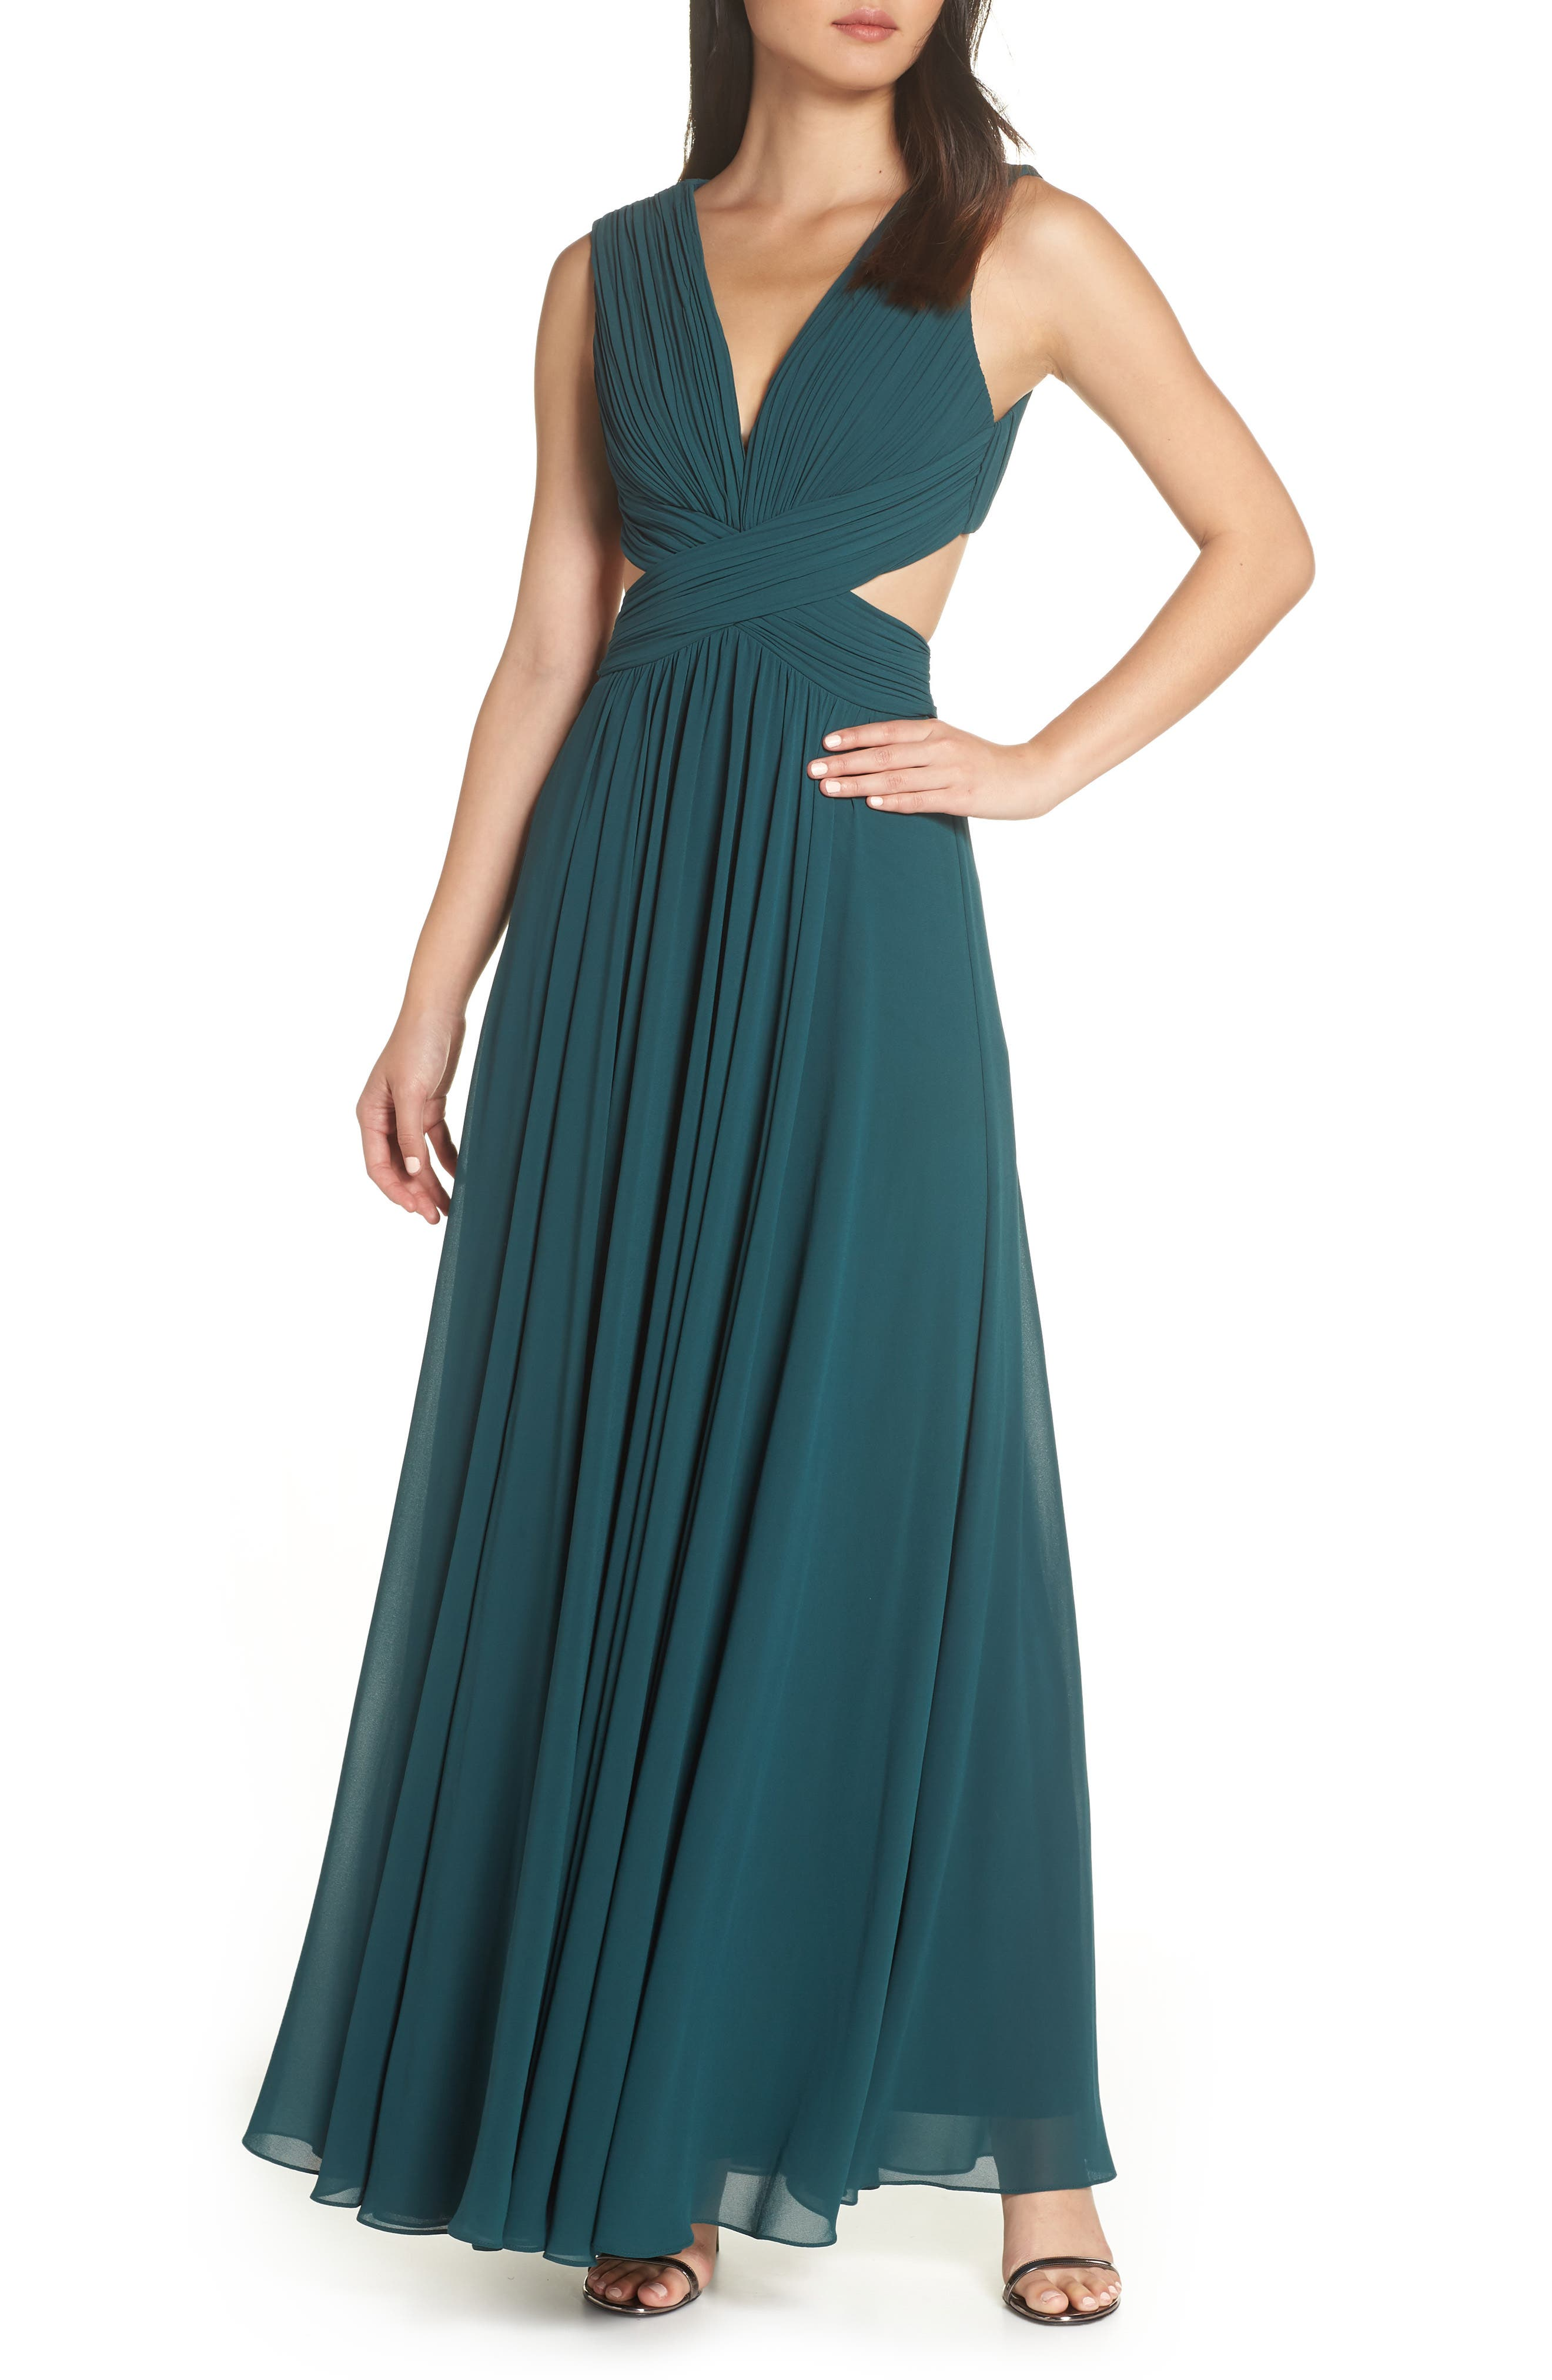 Lulus Vivid Imagination Chiffon Gown